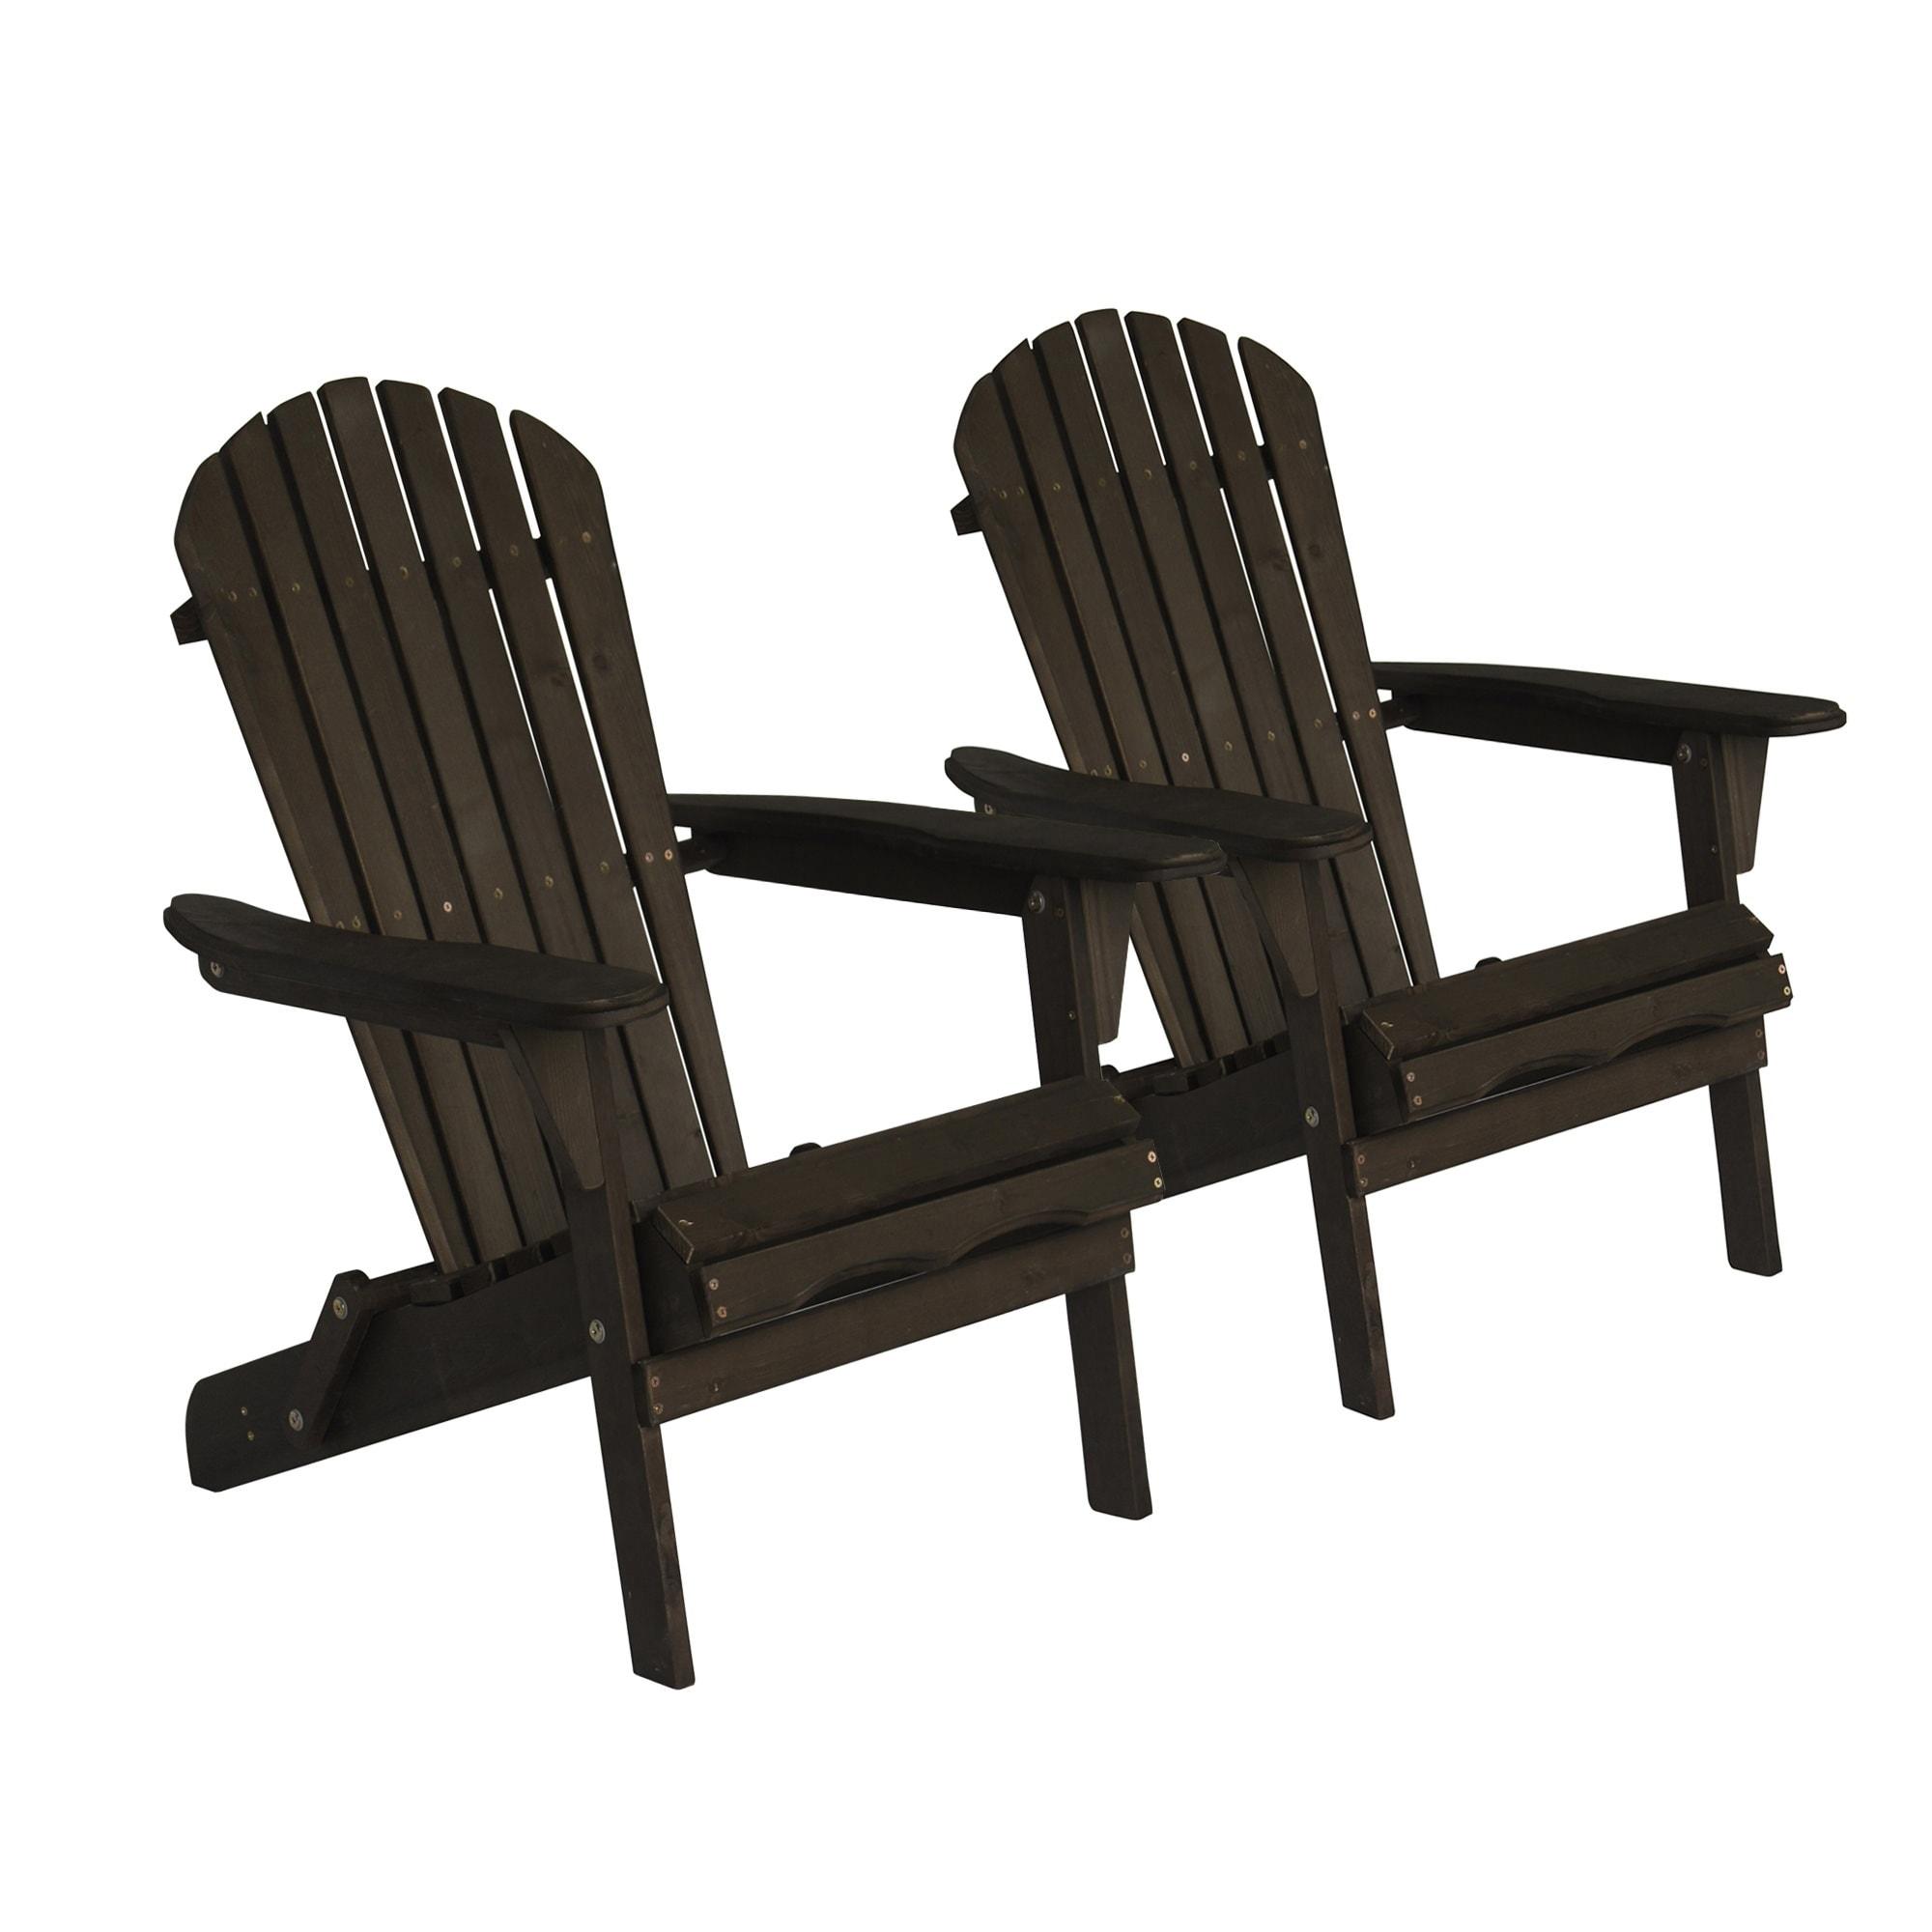 Havenside Home Bergen 2 Piece Foldable Adirondack Chair Set